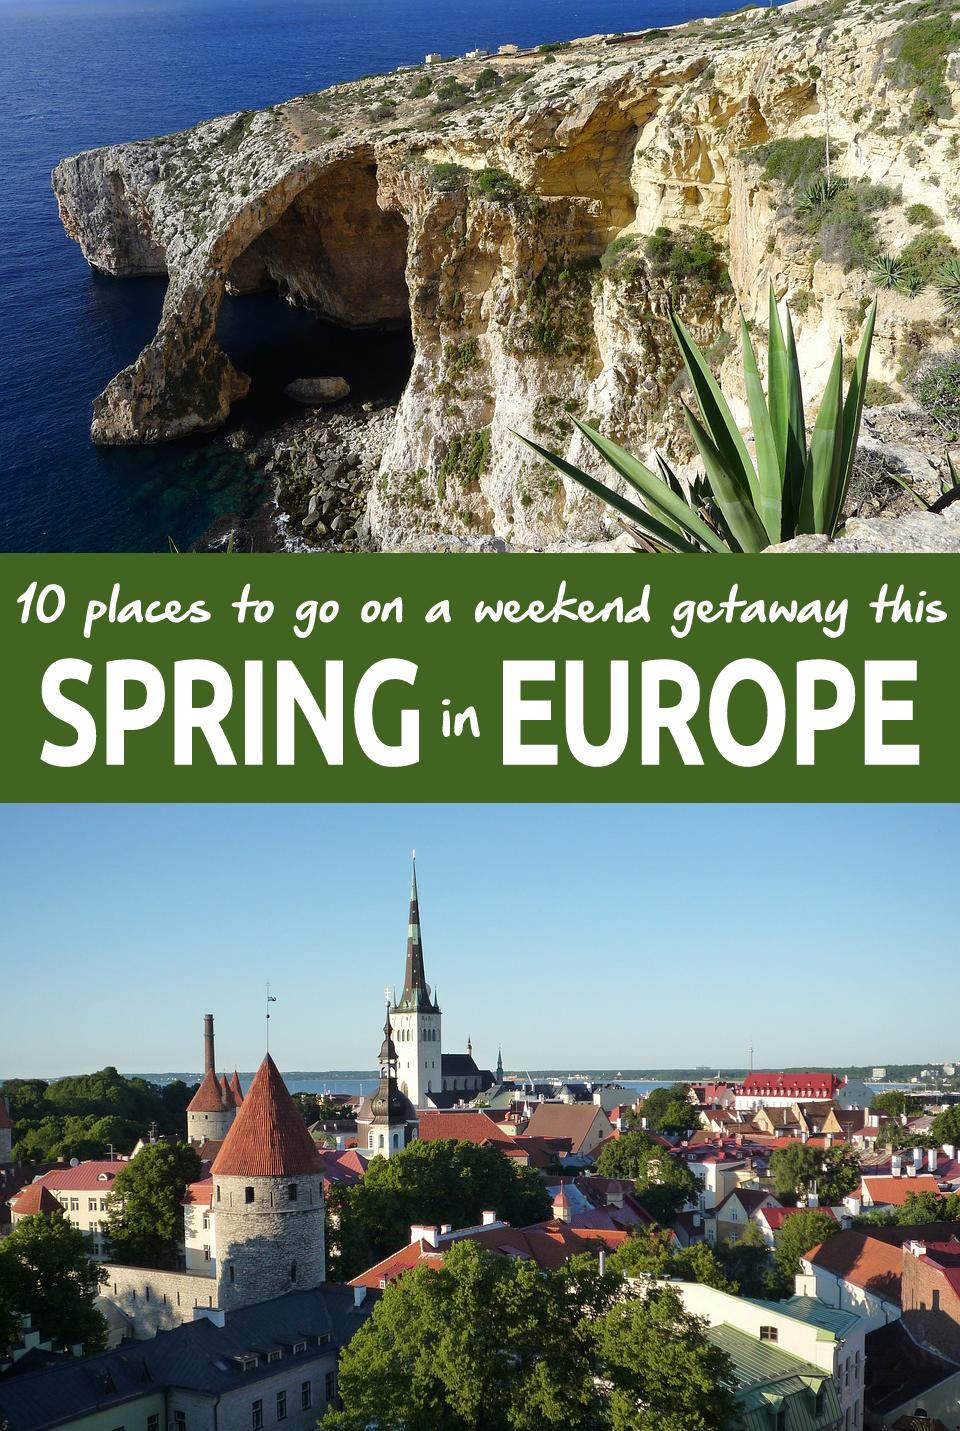 spring in europe